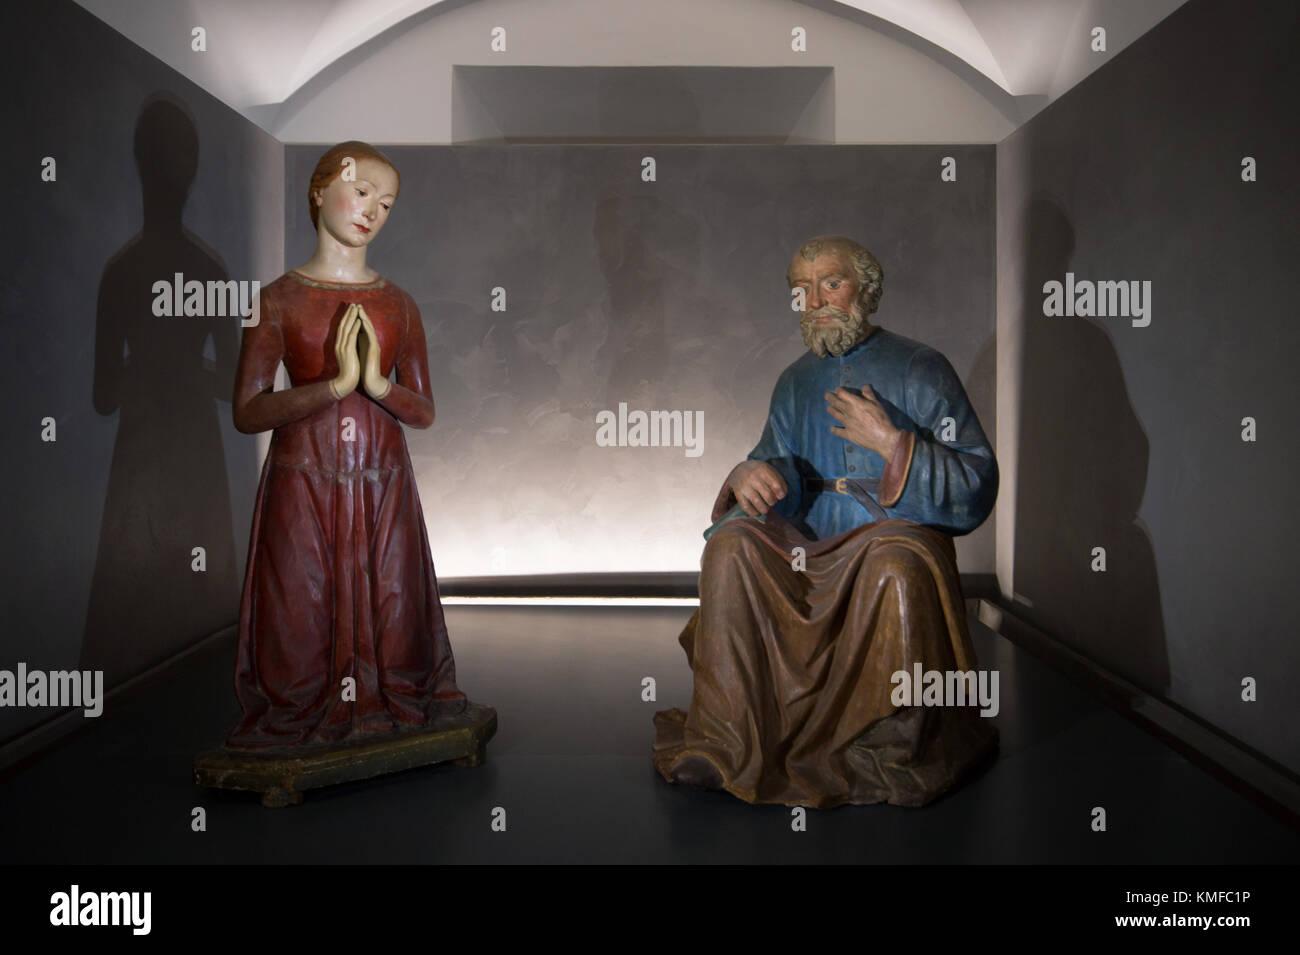 Marco della Robbia (Fra Mattia), Adoring Madonna and Saint Joseph, c. 1500, painted terracotta, Renaissance sculpture, - Stock Image